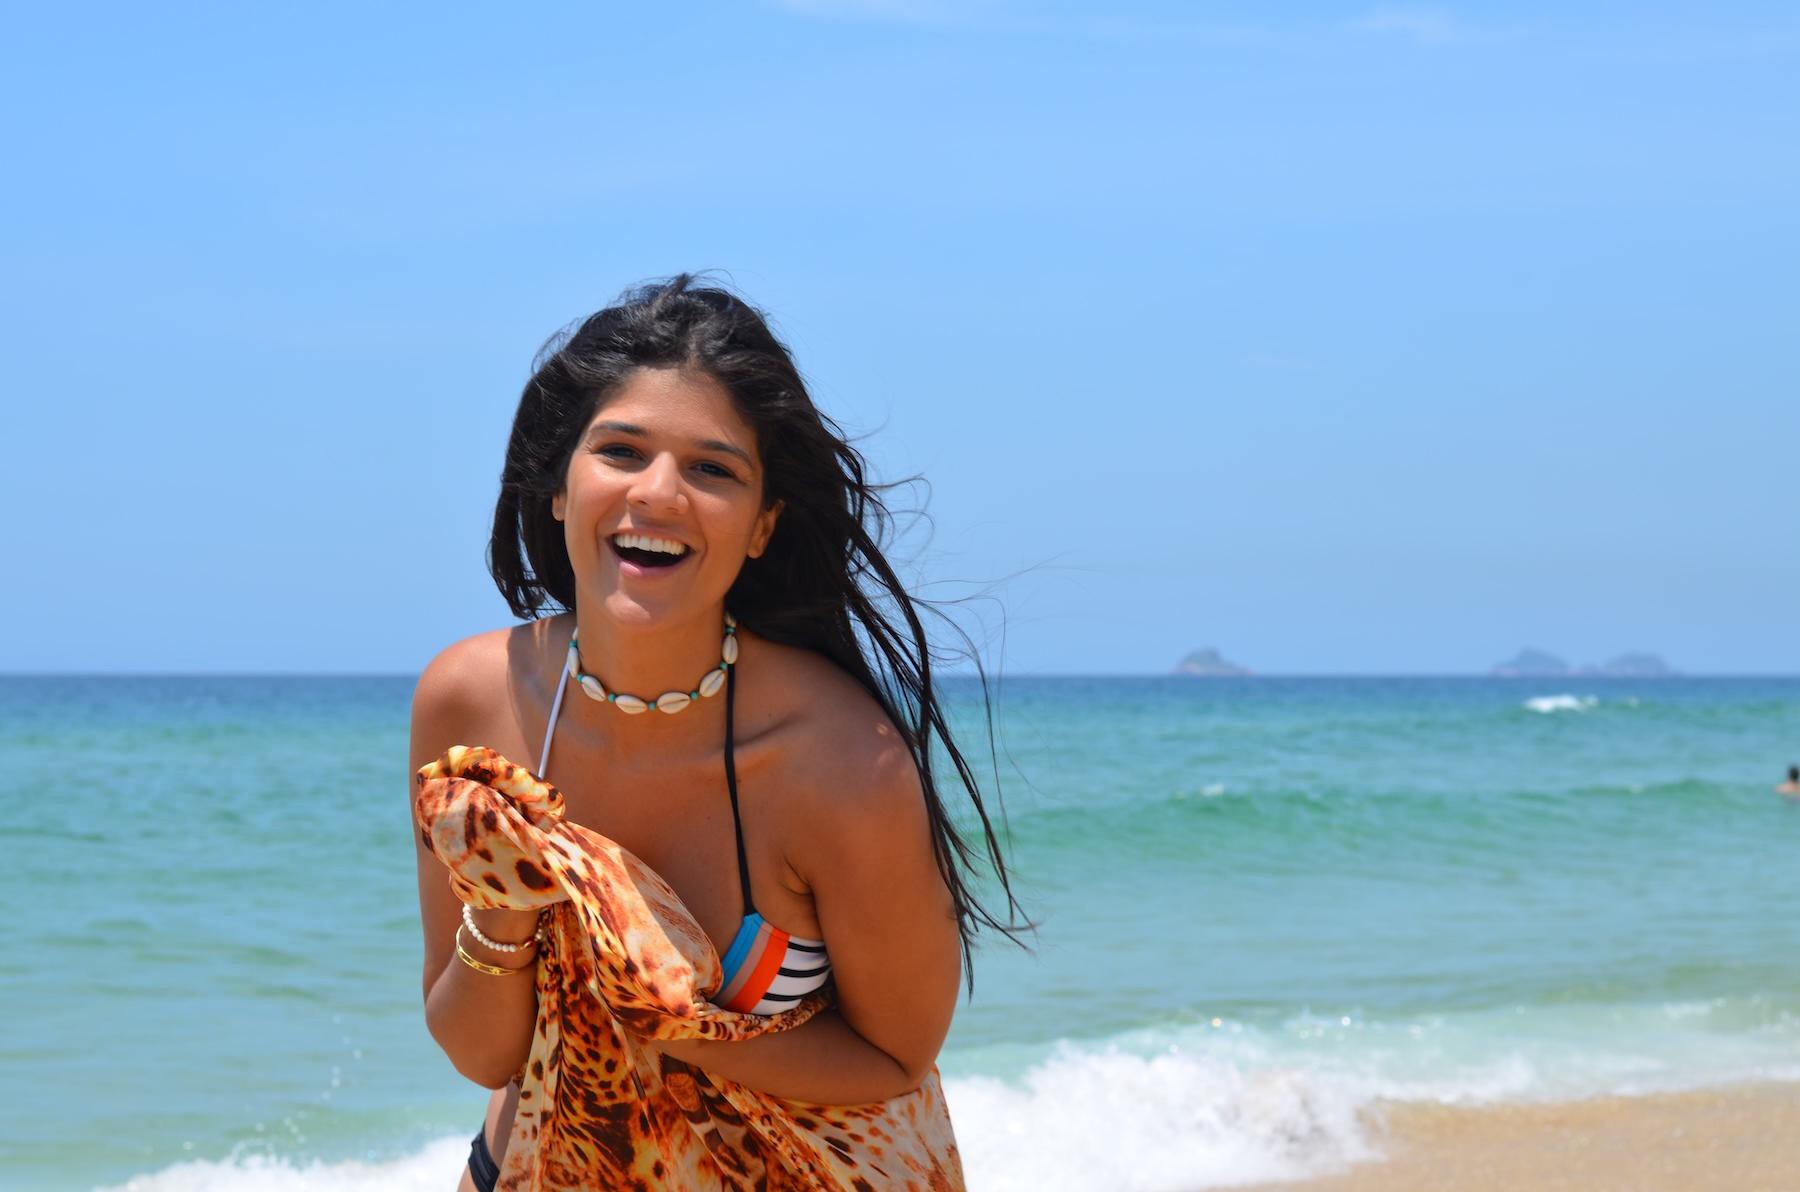 praia-de-ipanema-beta-pinheiro-1